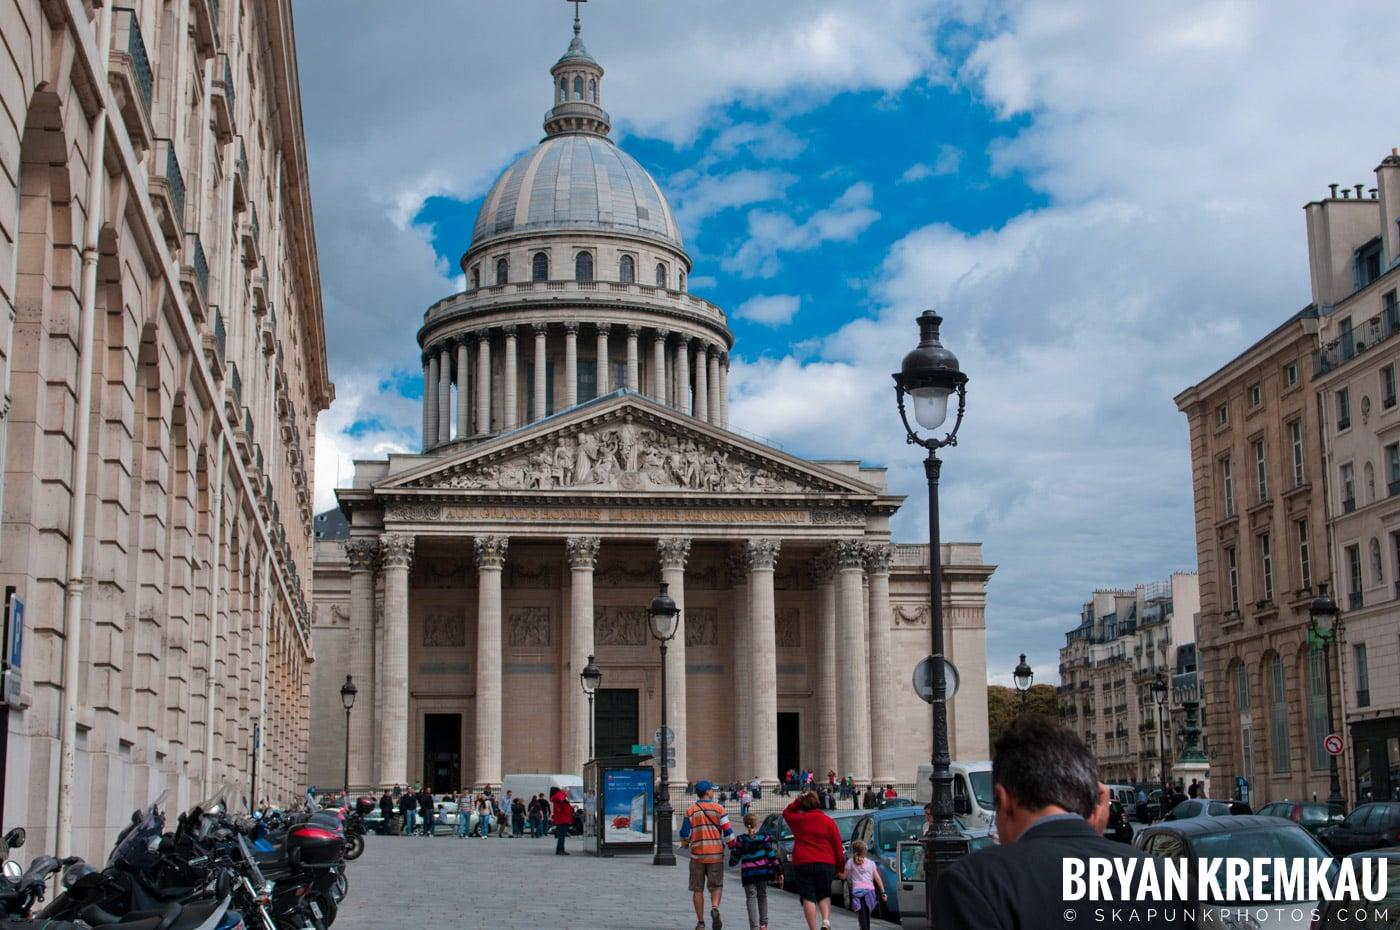 Paris, France Honeymoon - Day 1 - 7.18.11 (59)